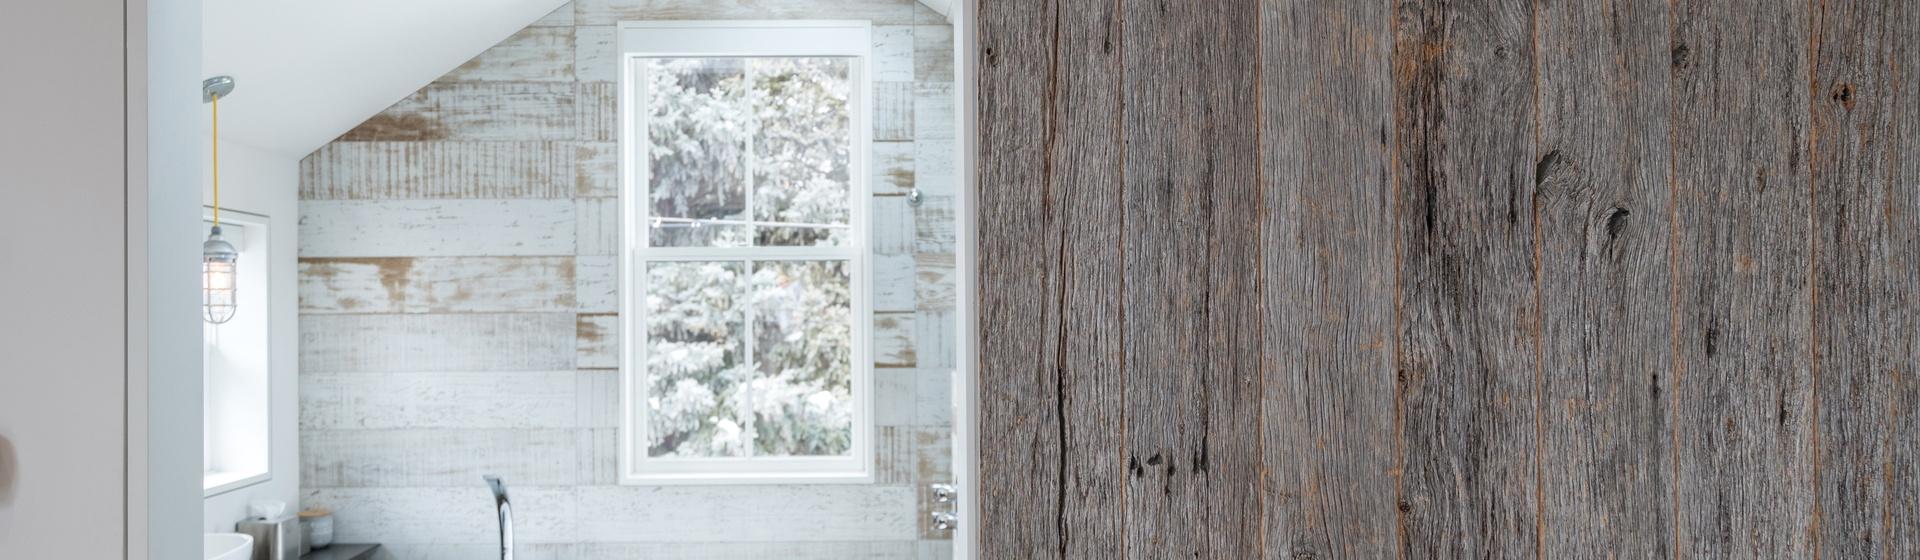 12-Telluride-The-Sunnyside-Main-Level-Master-Bath-Door-Web.jpg